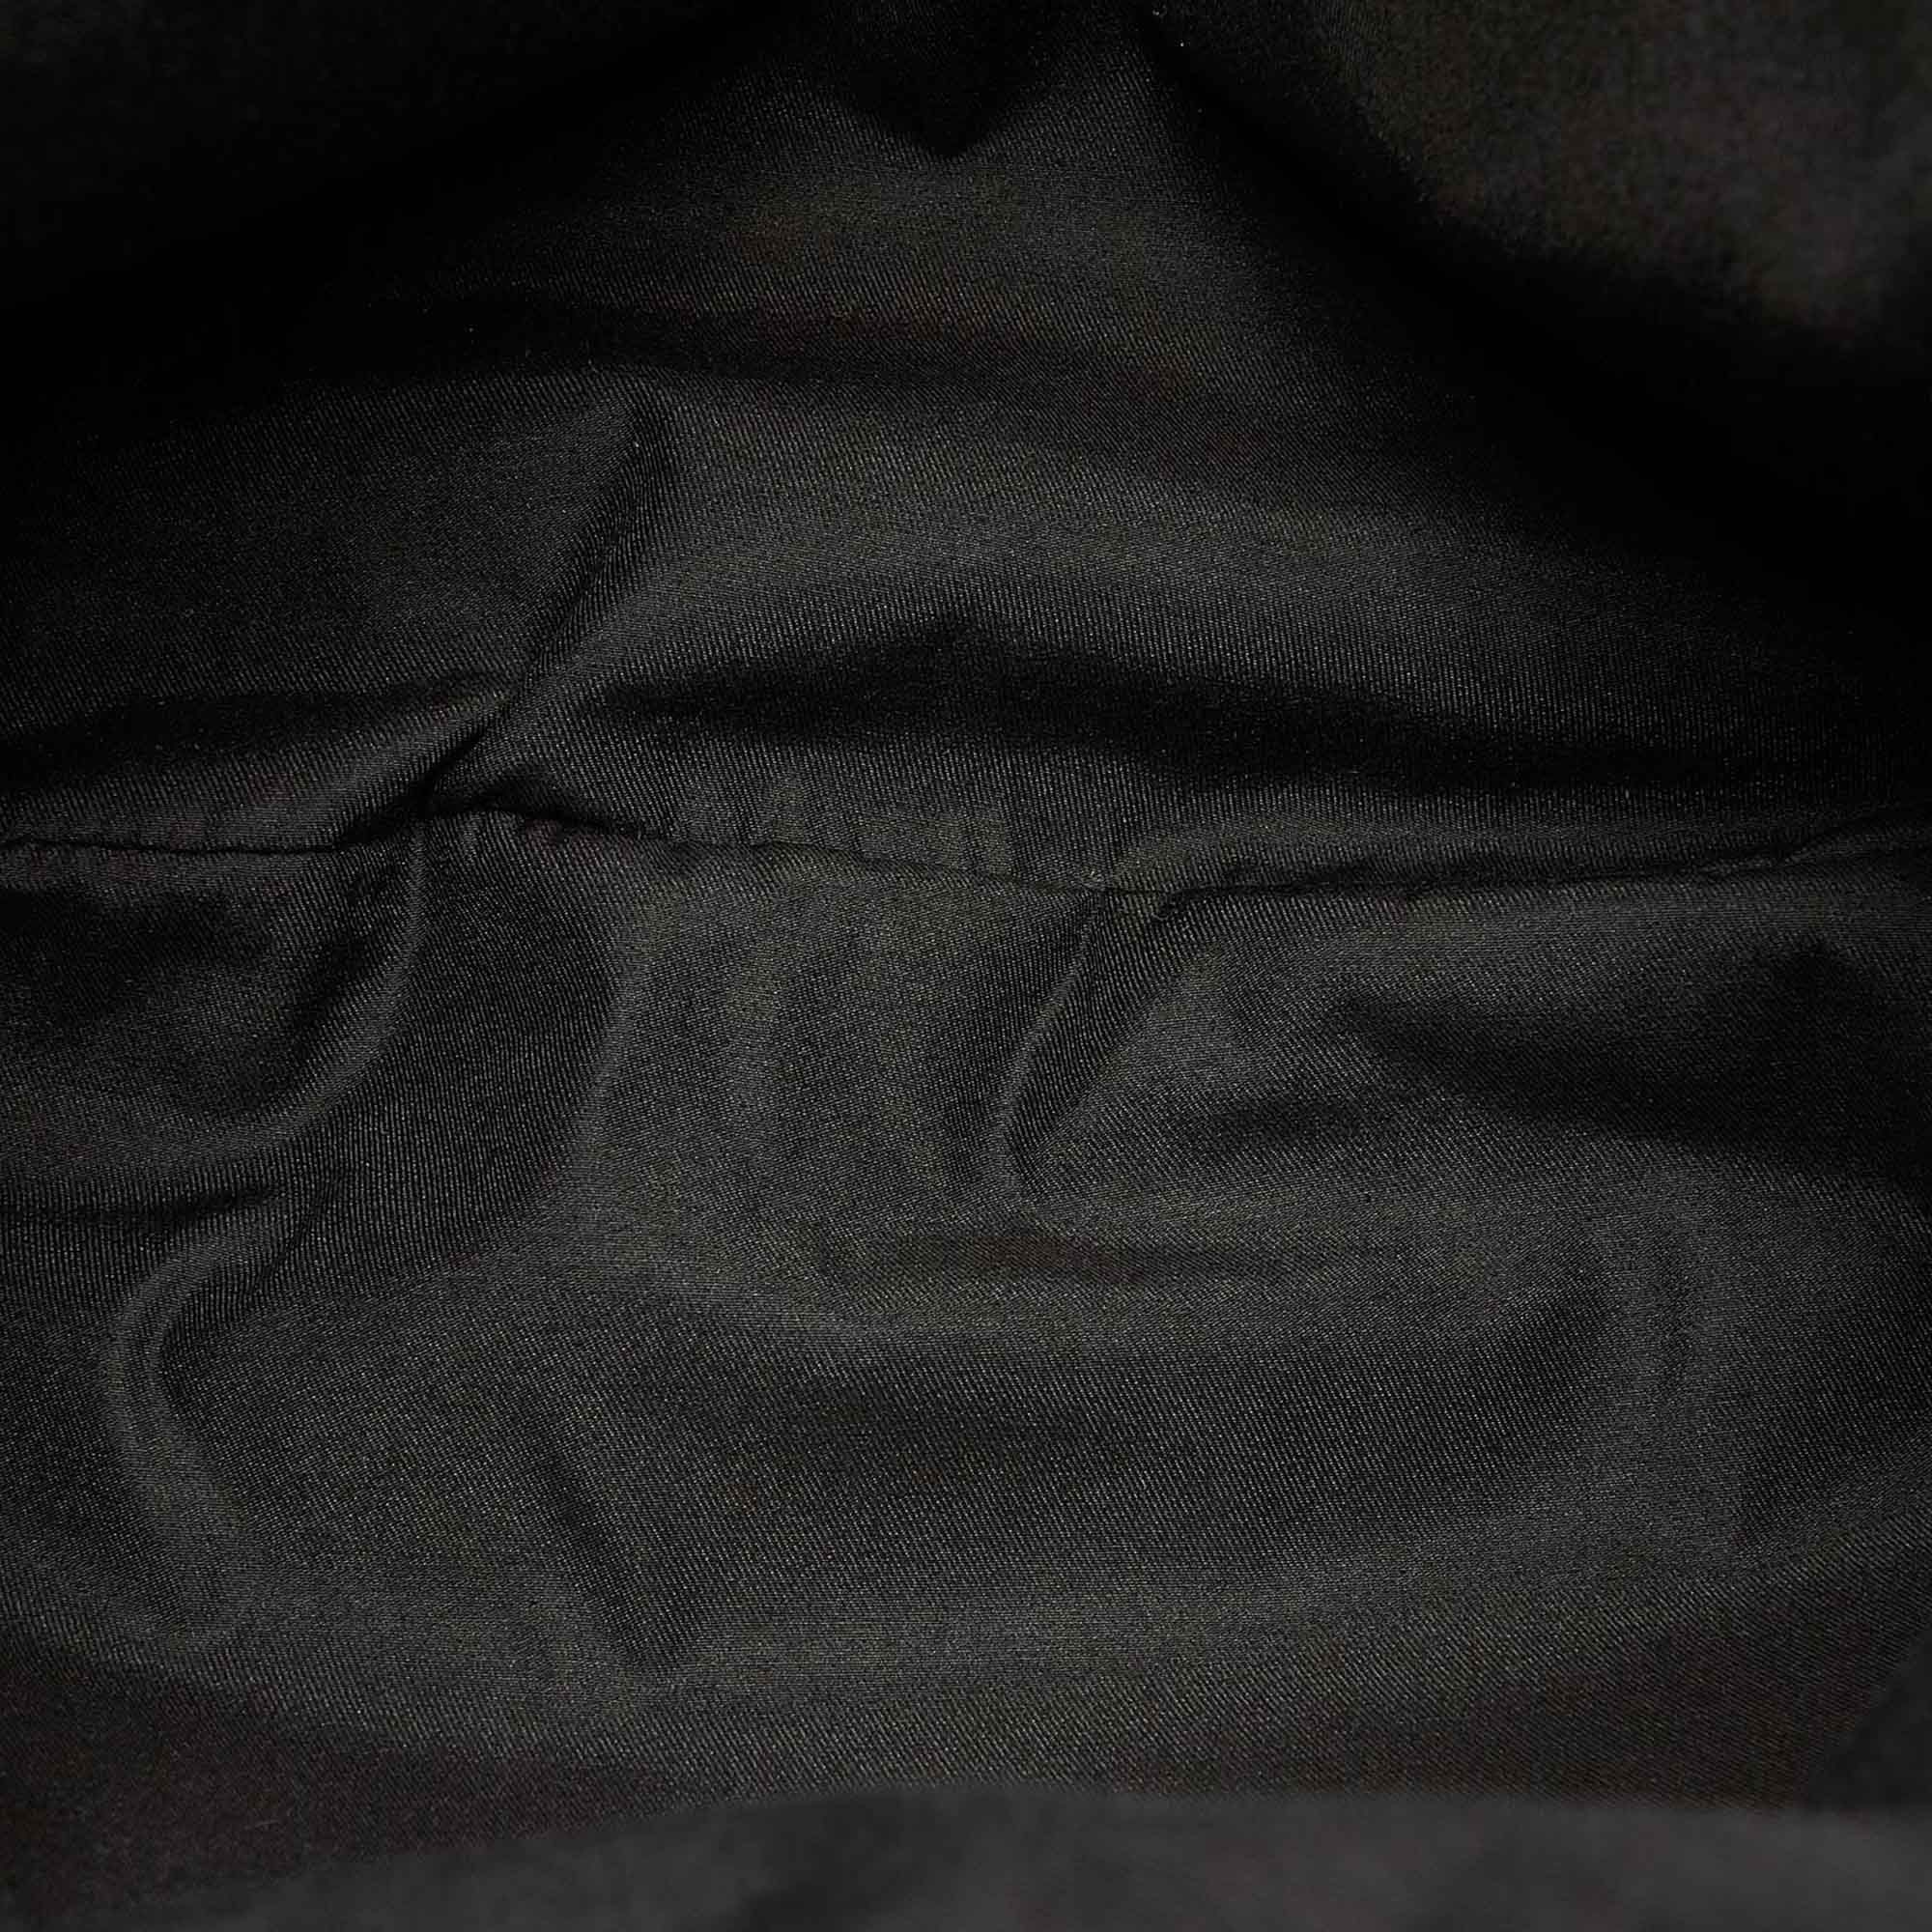 Vintage Gucci GG Canvas Abbey Tote Bag Black